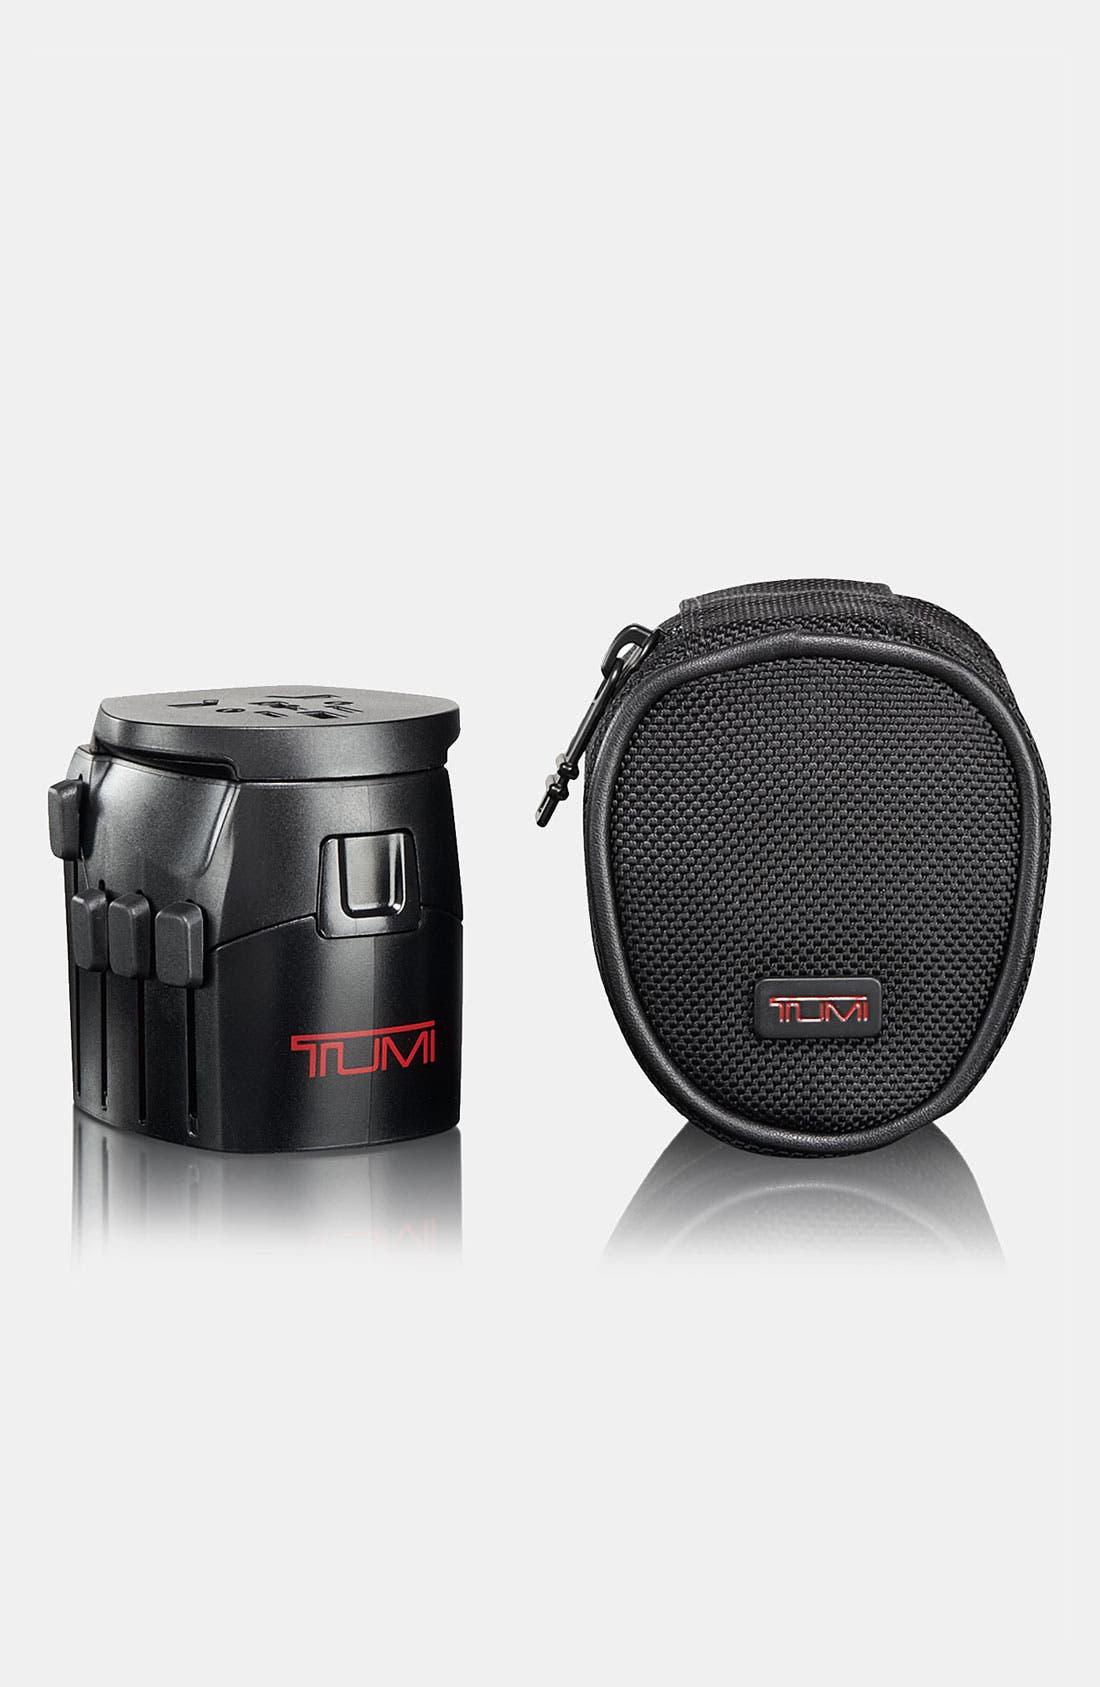 Main Image - Tumi Grounded Electric Travel Adaptor with Ballistic Nylon Case